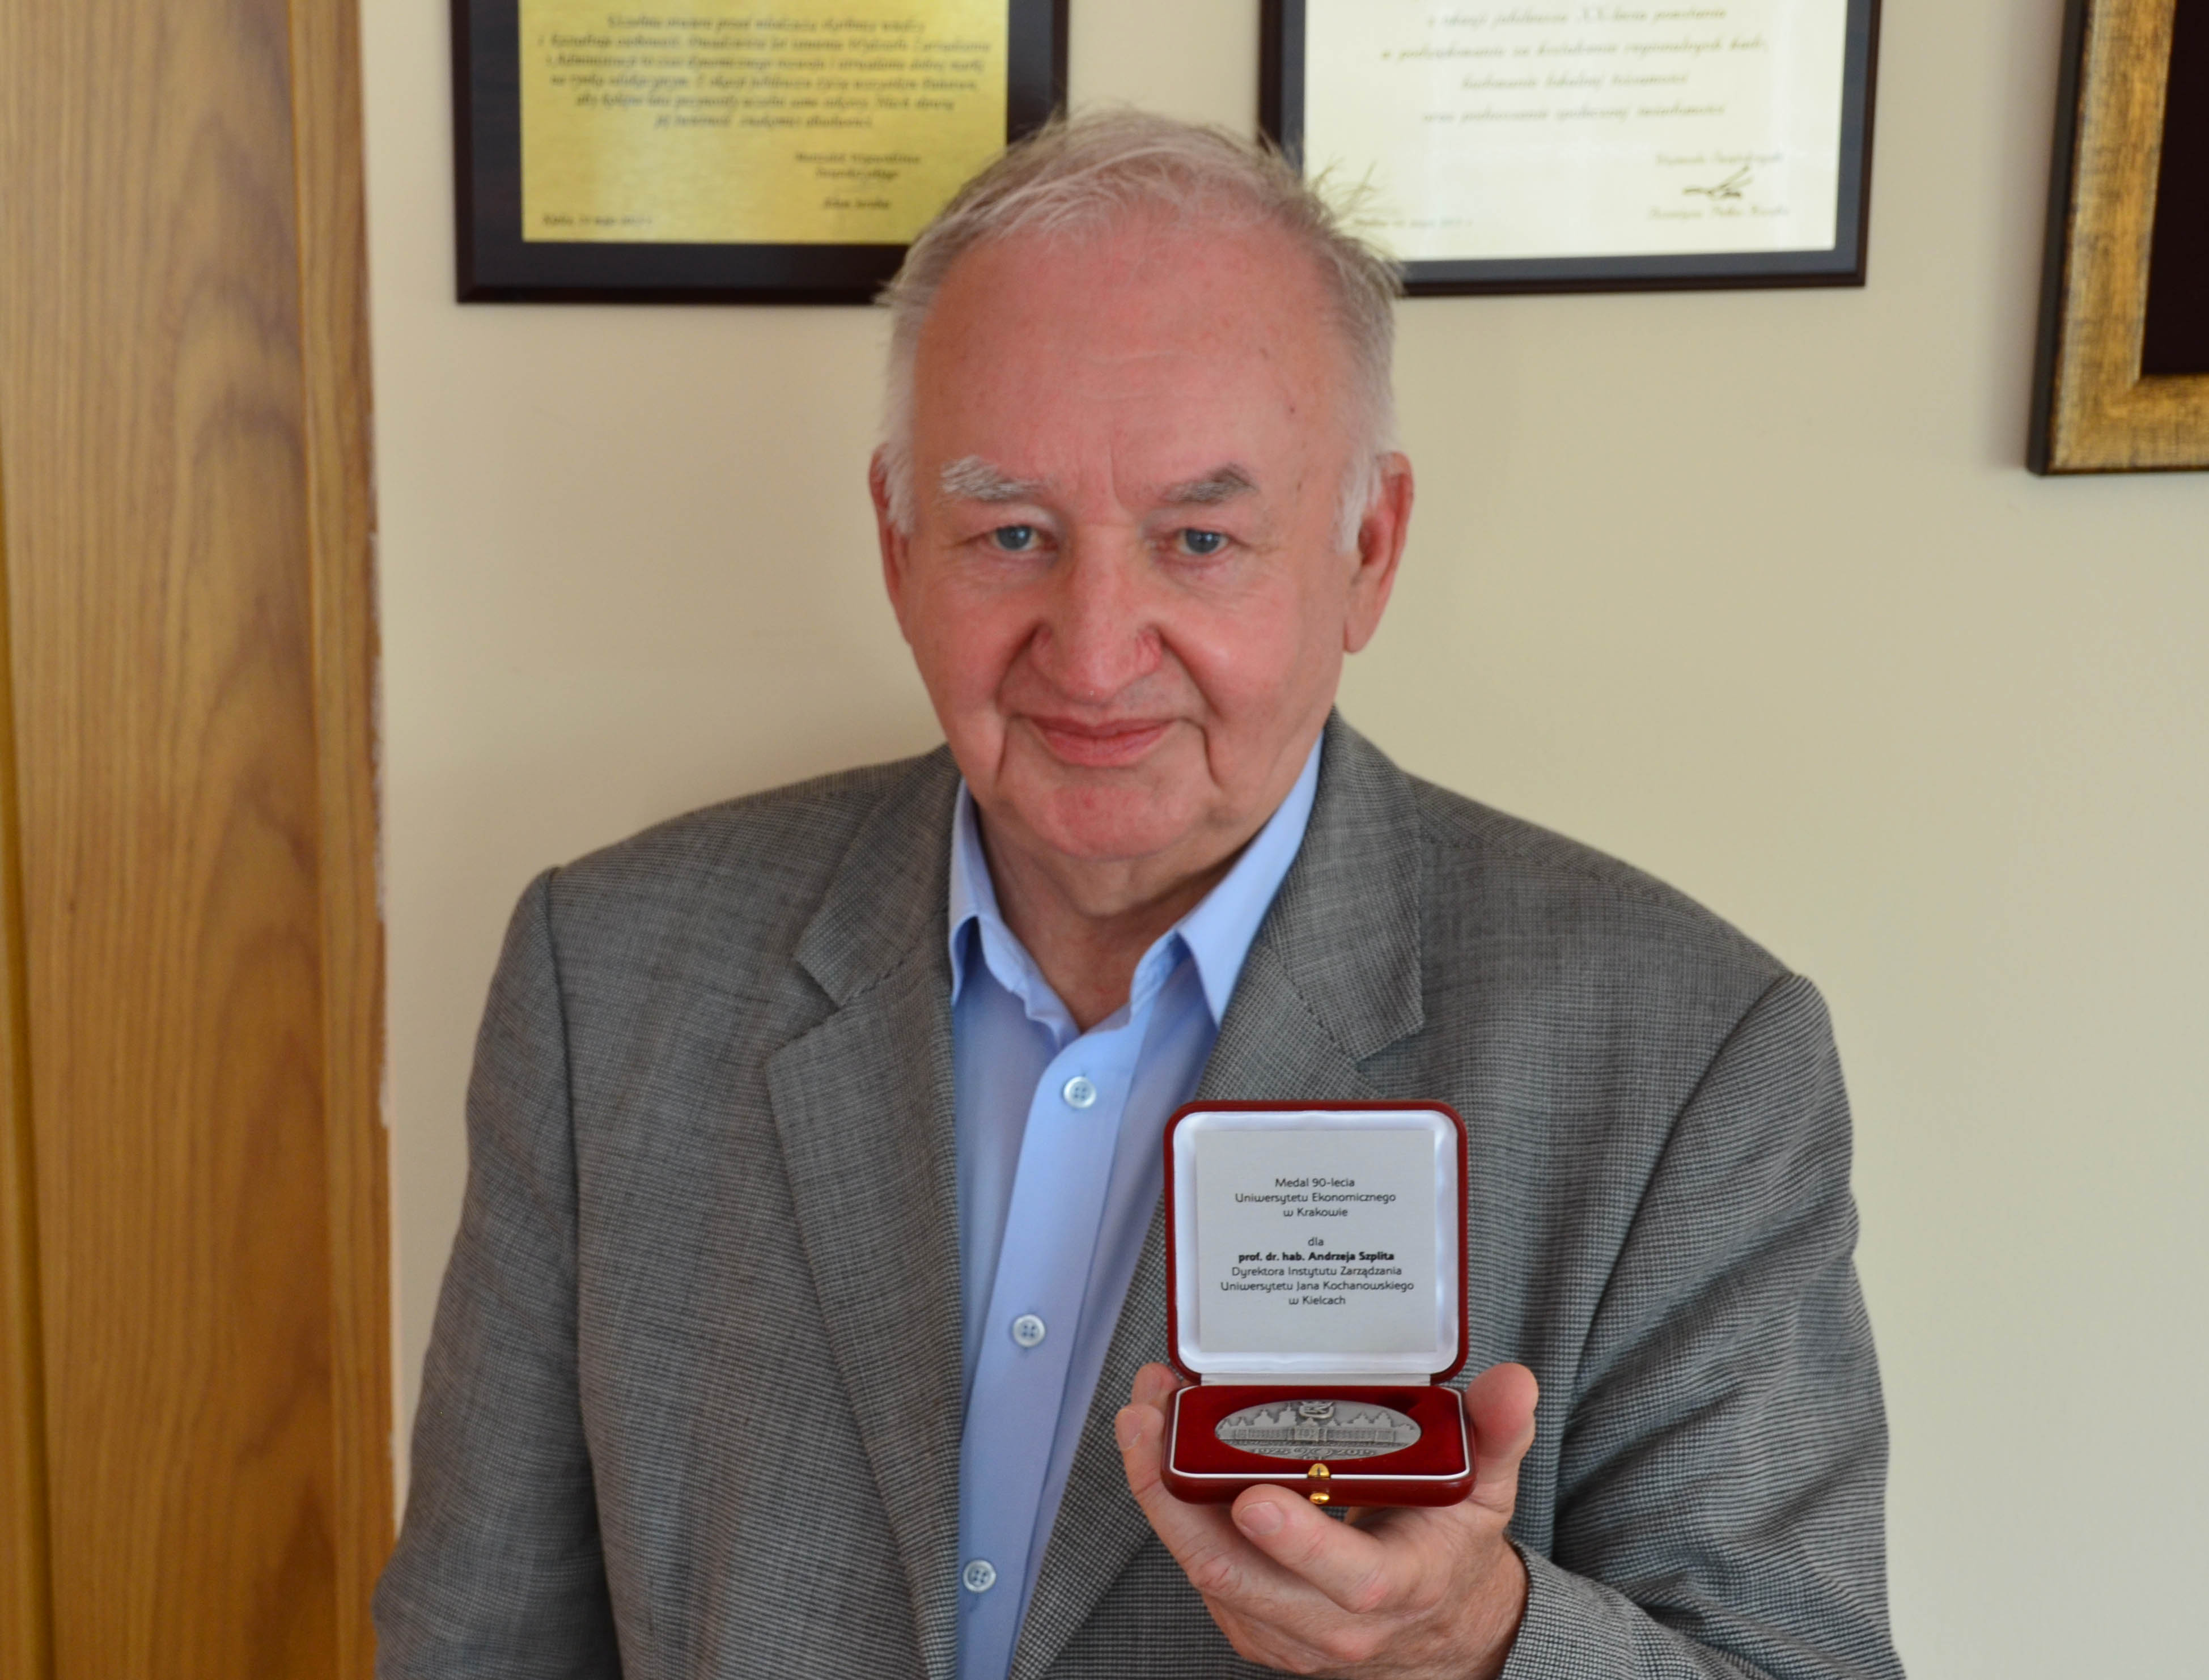 Medal dla prof. UJK dr hab. Andrzeja Szplita